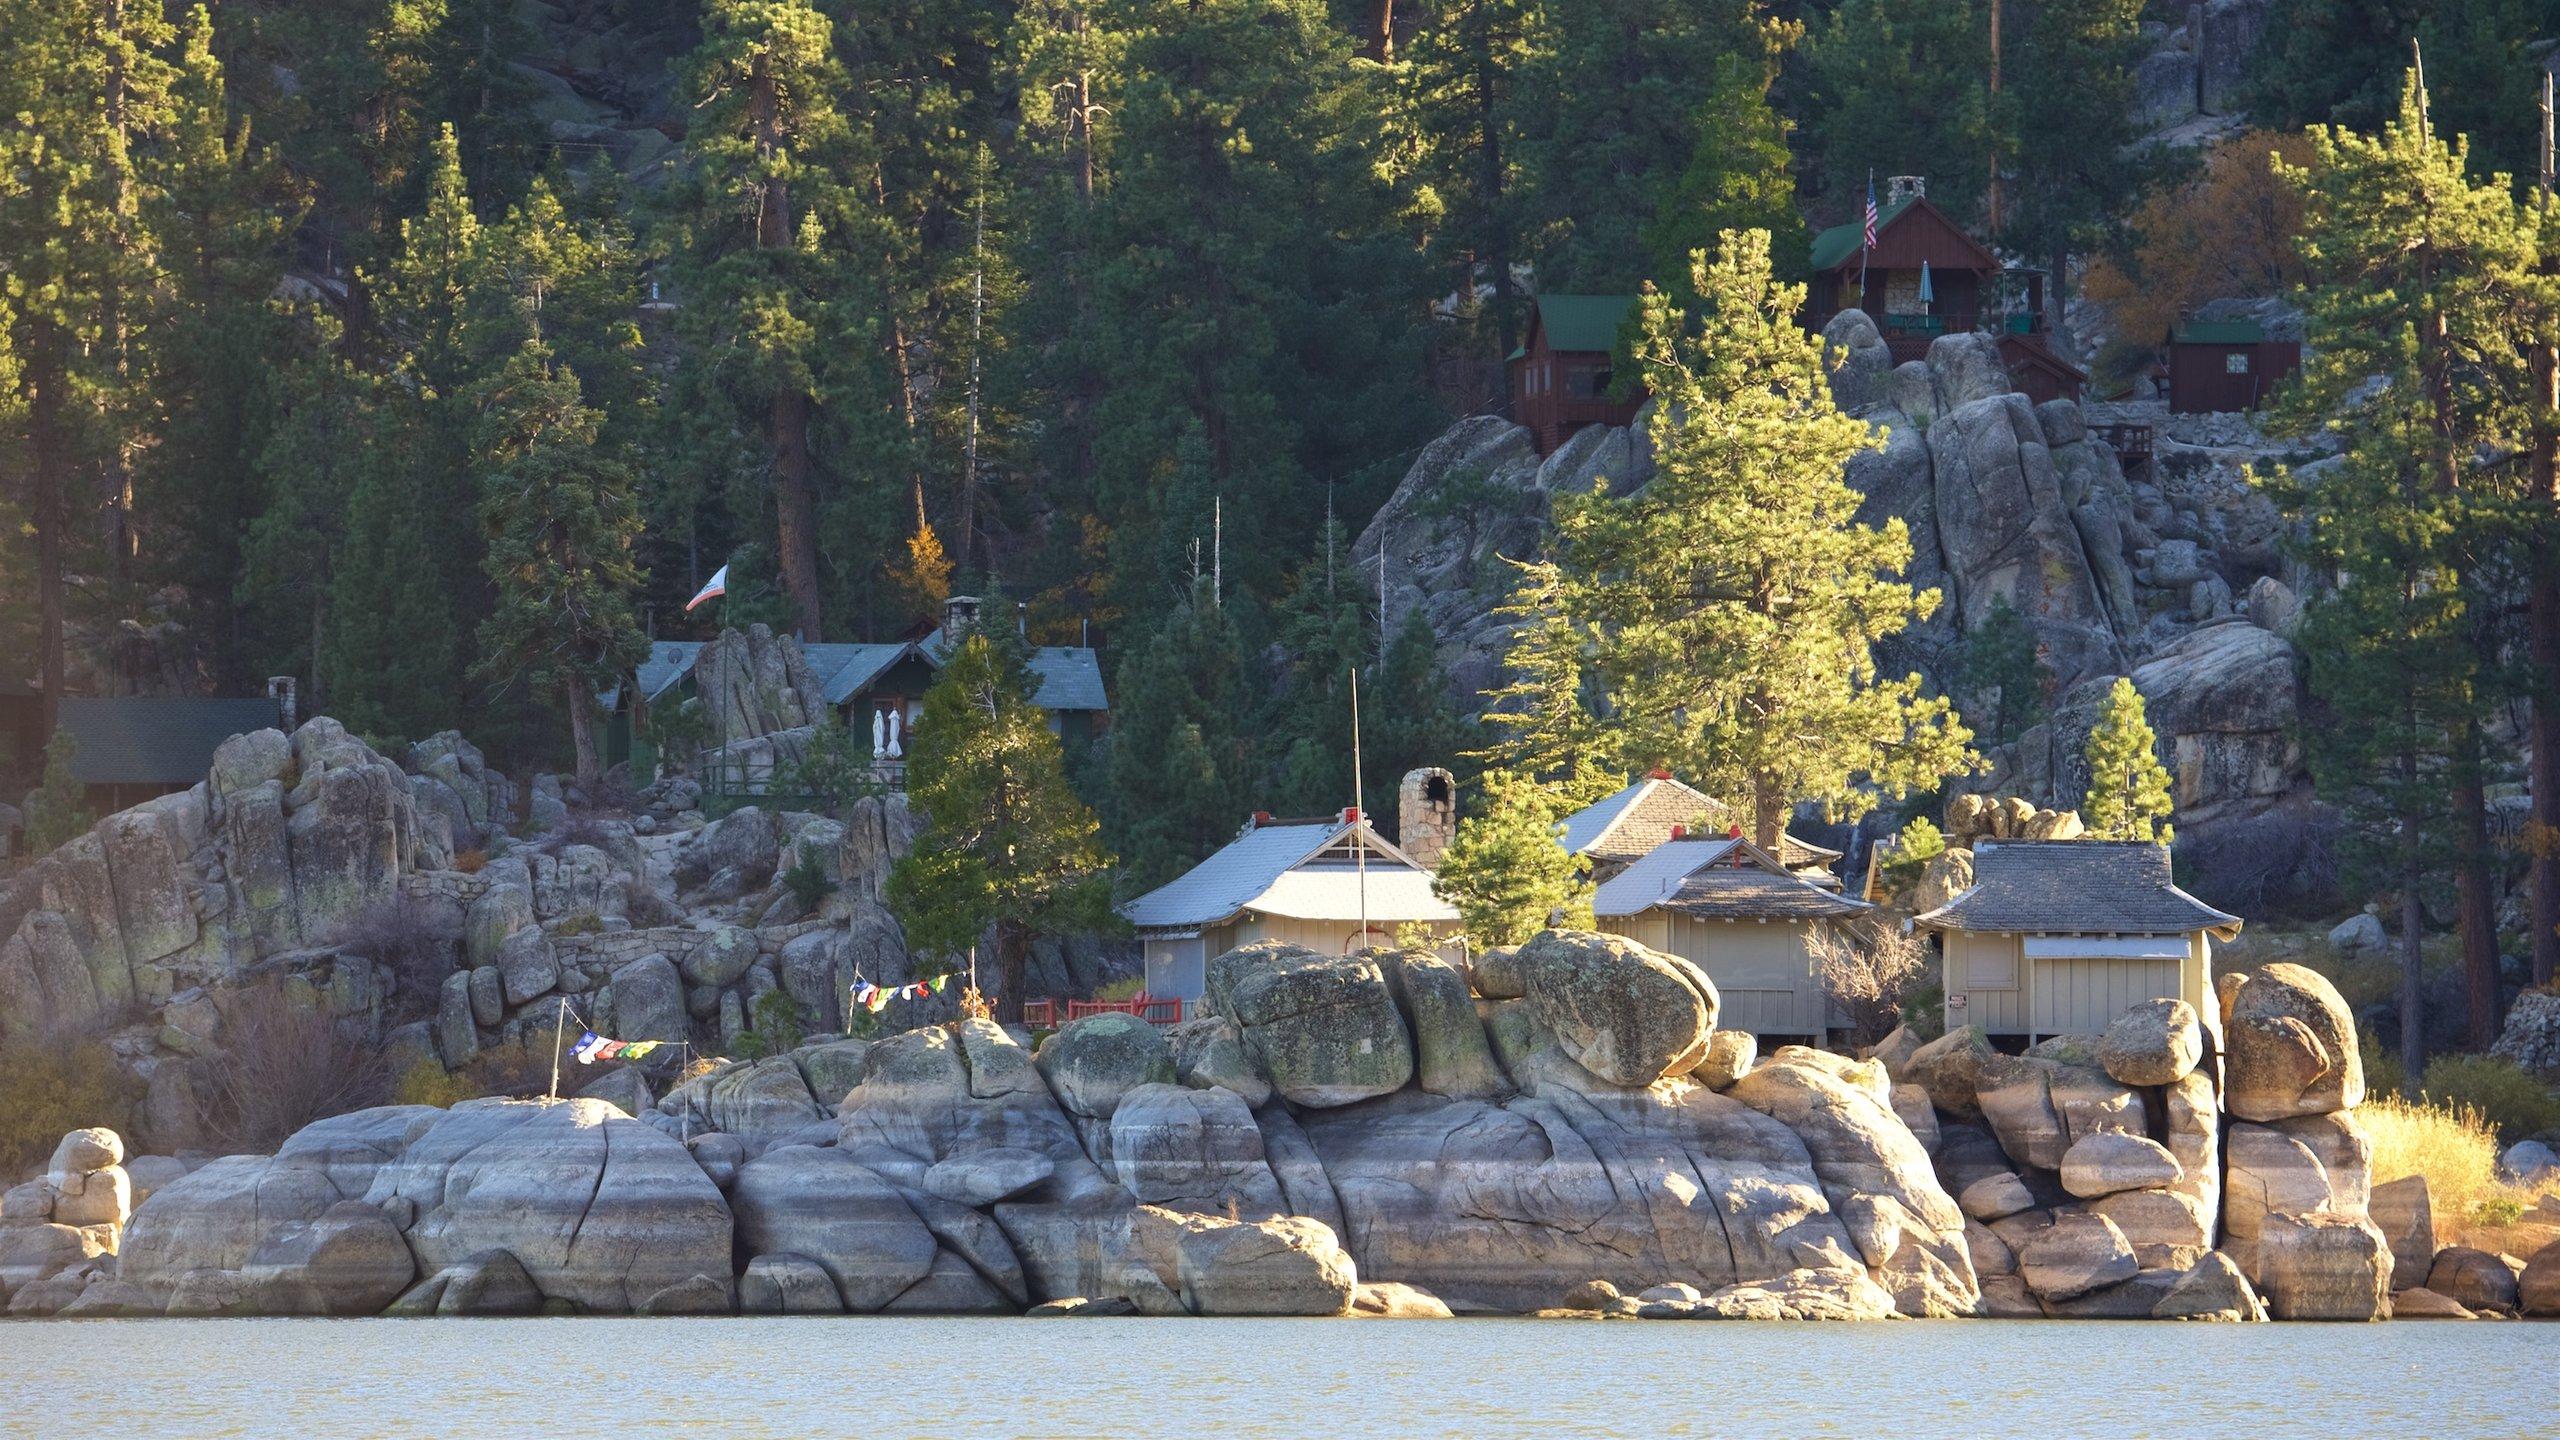 Top 10 Pet Friendly Hotels In Big Bear Lake, CA $46: Dog & Cat